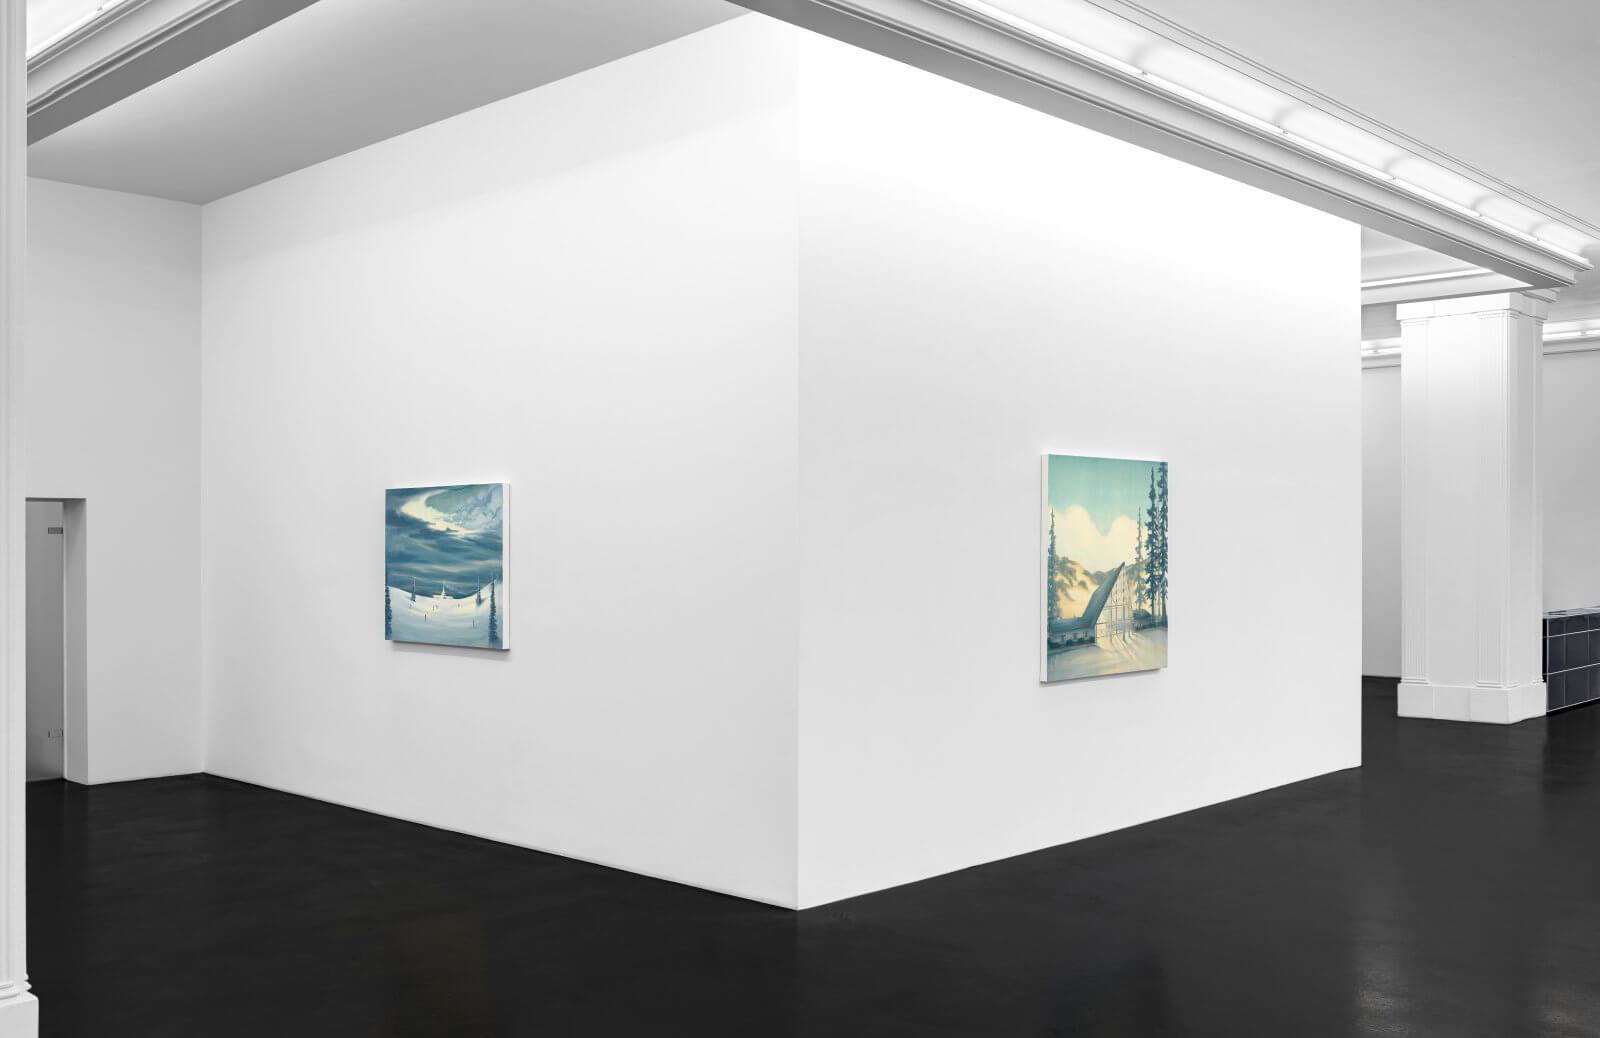 DA-Natural-Selections-Installation-View-4-HIRES-1600x1039.jpg